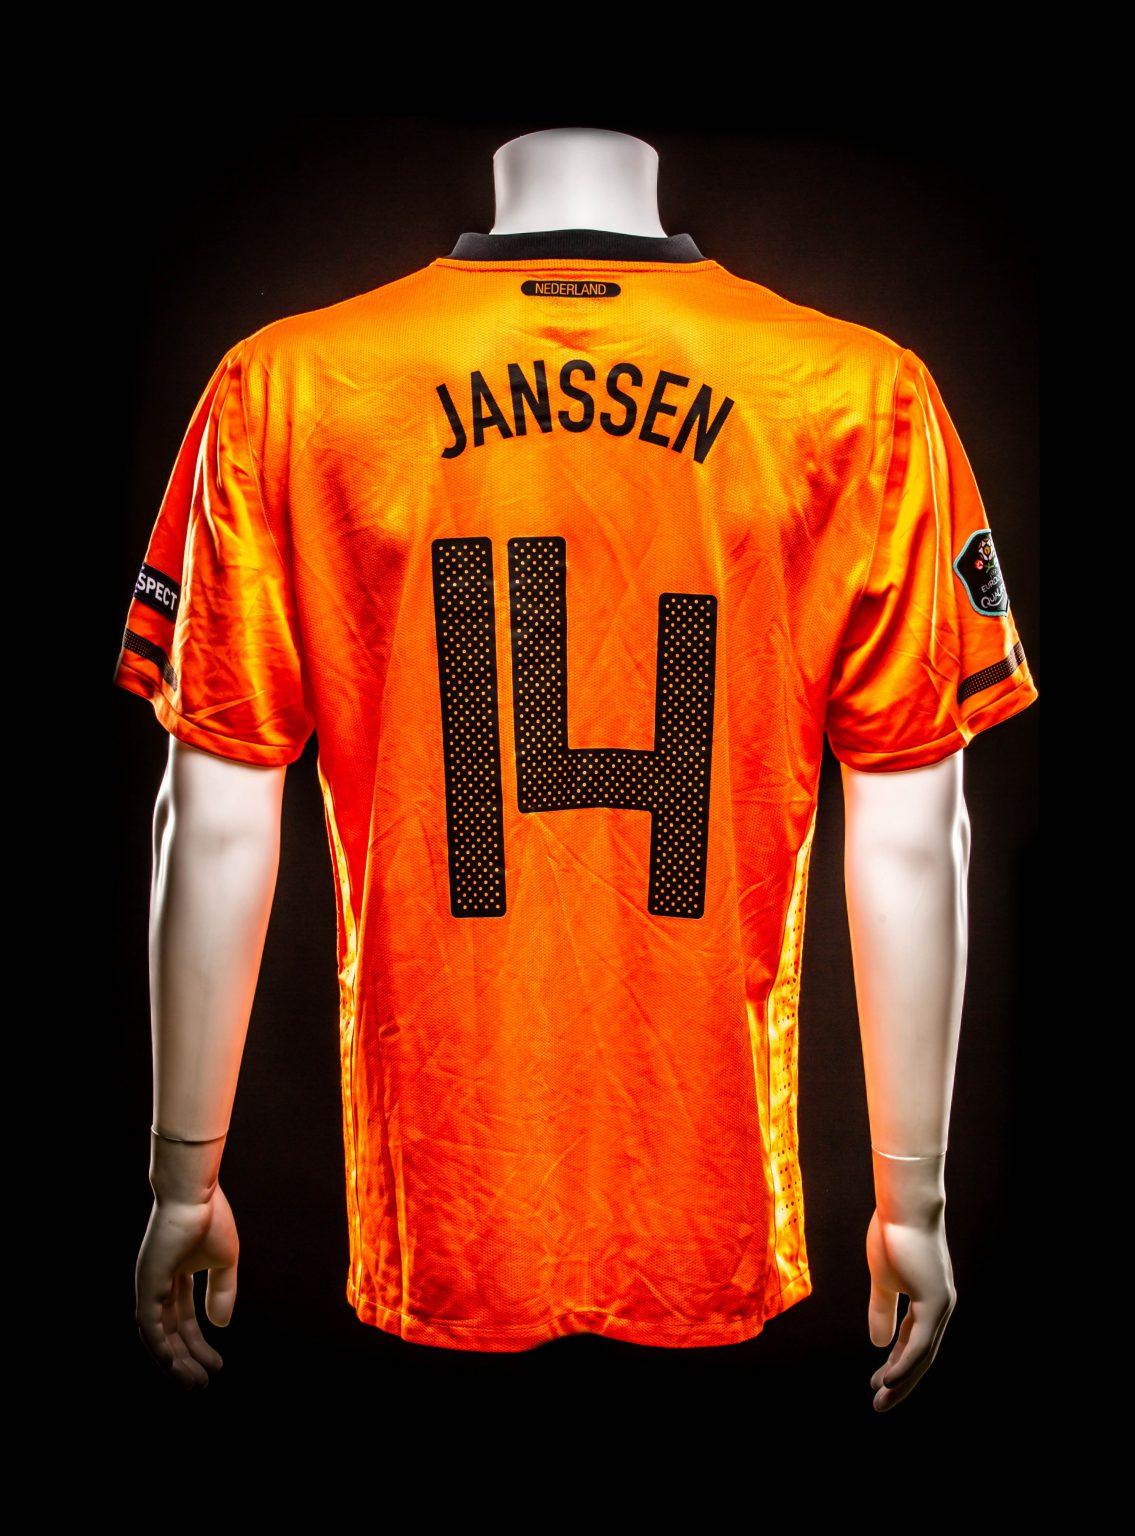 #14 Theo Janssen 2010